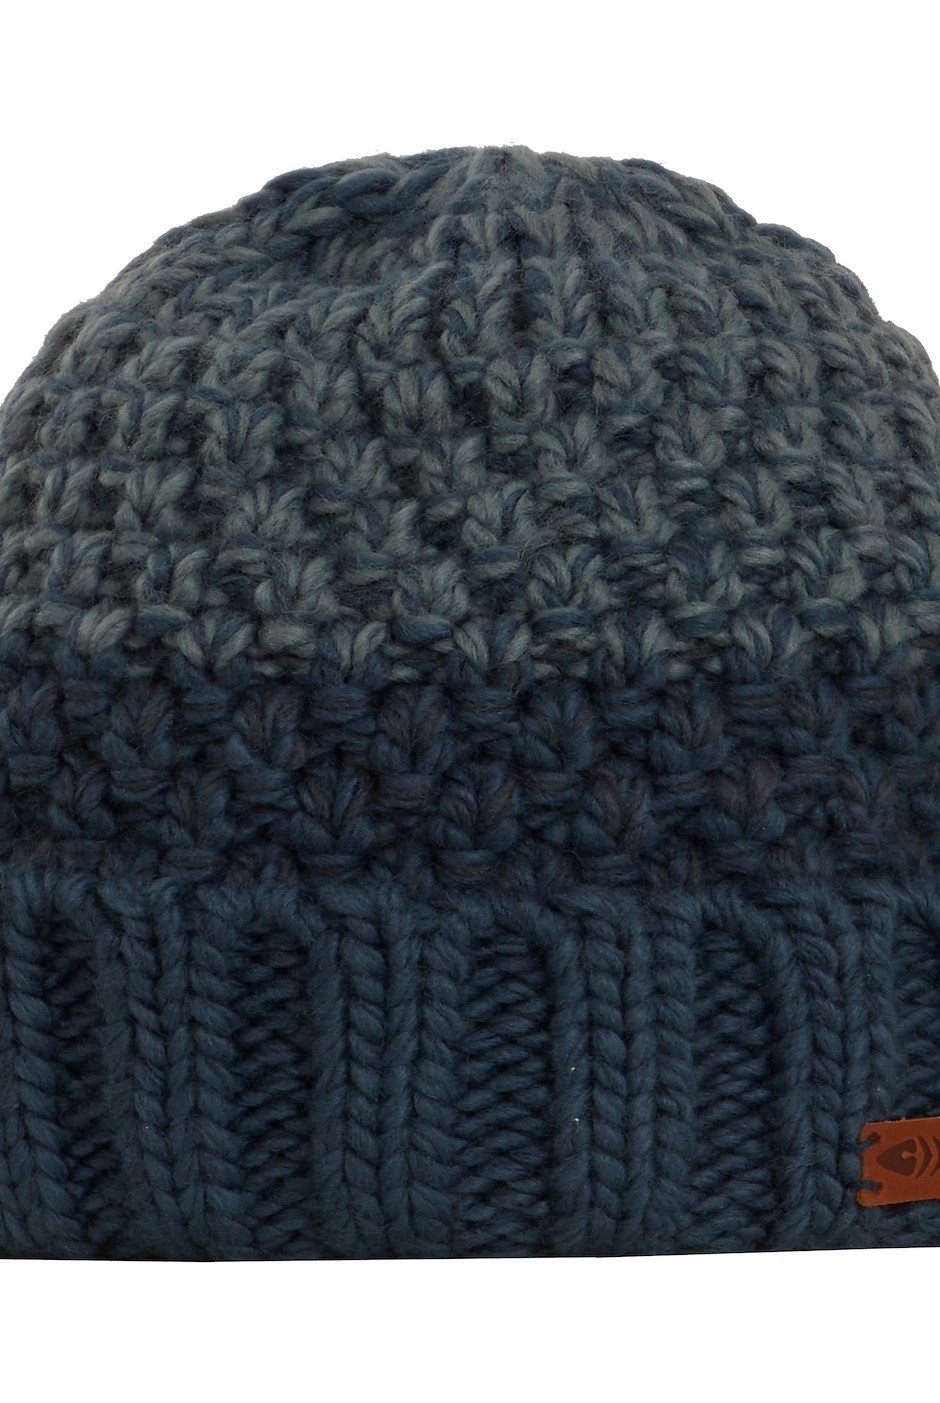 Halton Knit Beanie Navy